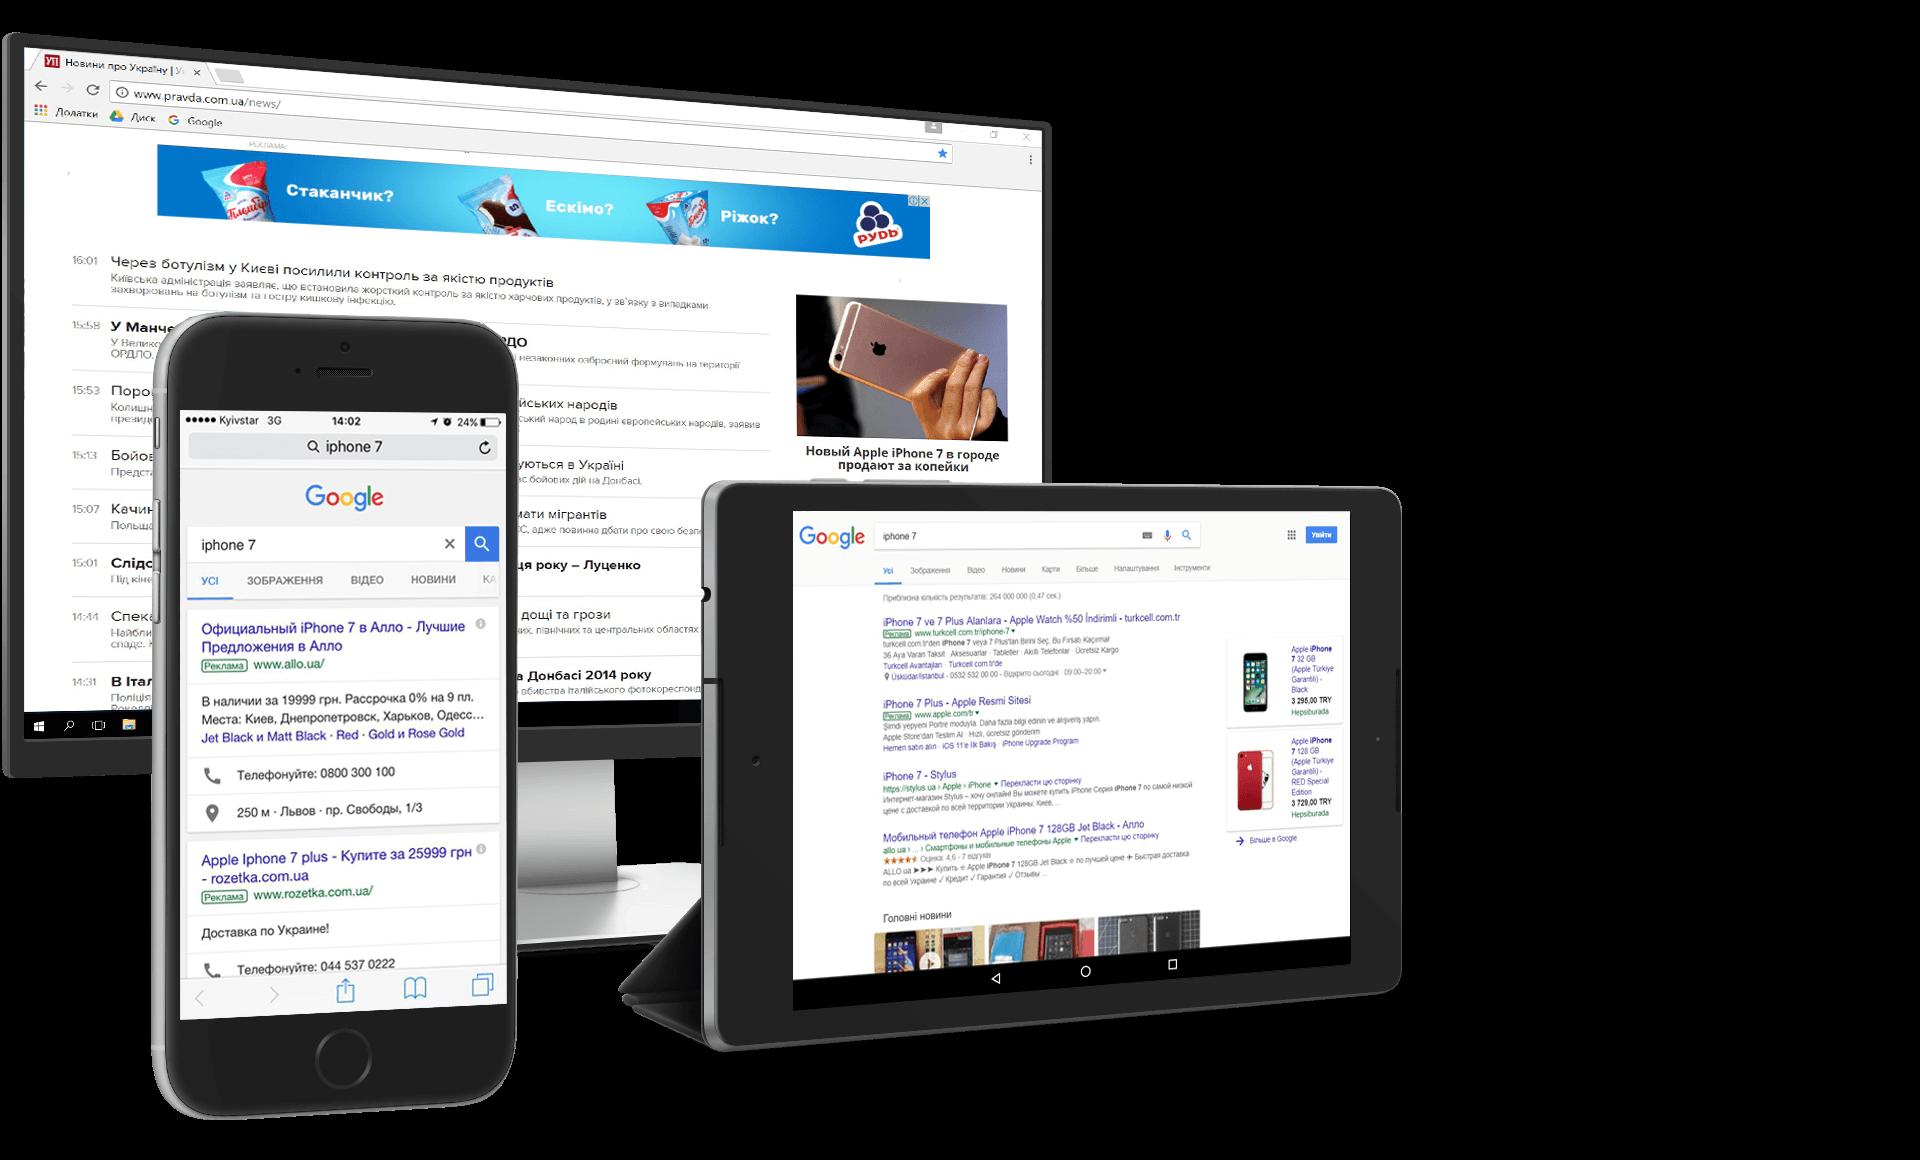 адвордс, банерна реклама, інтернет реклама, контекстна реклама, контекстна реклама google